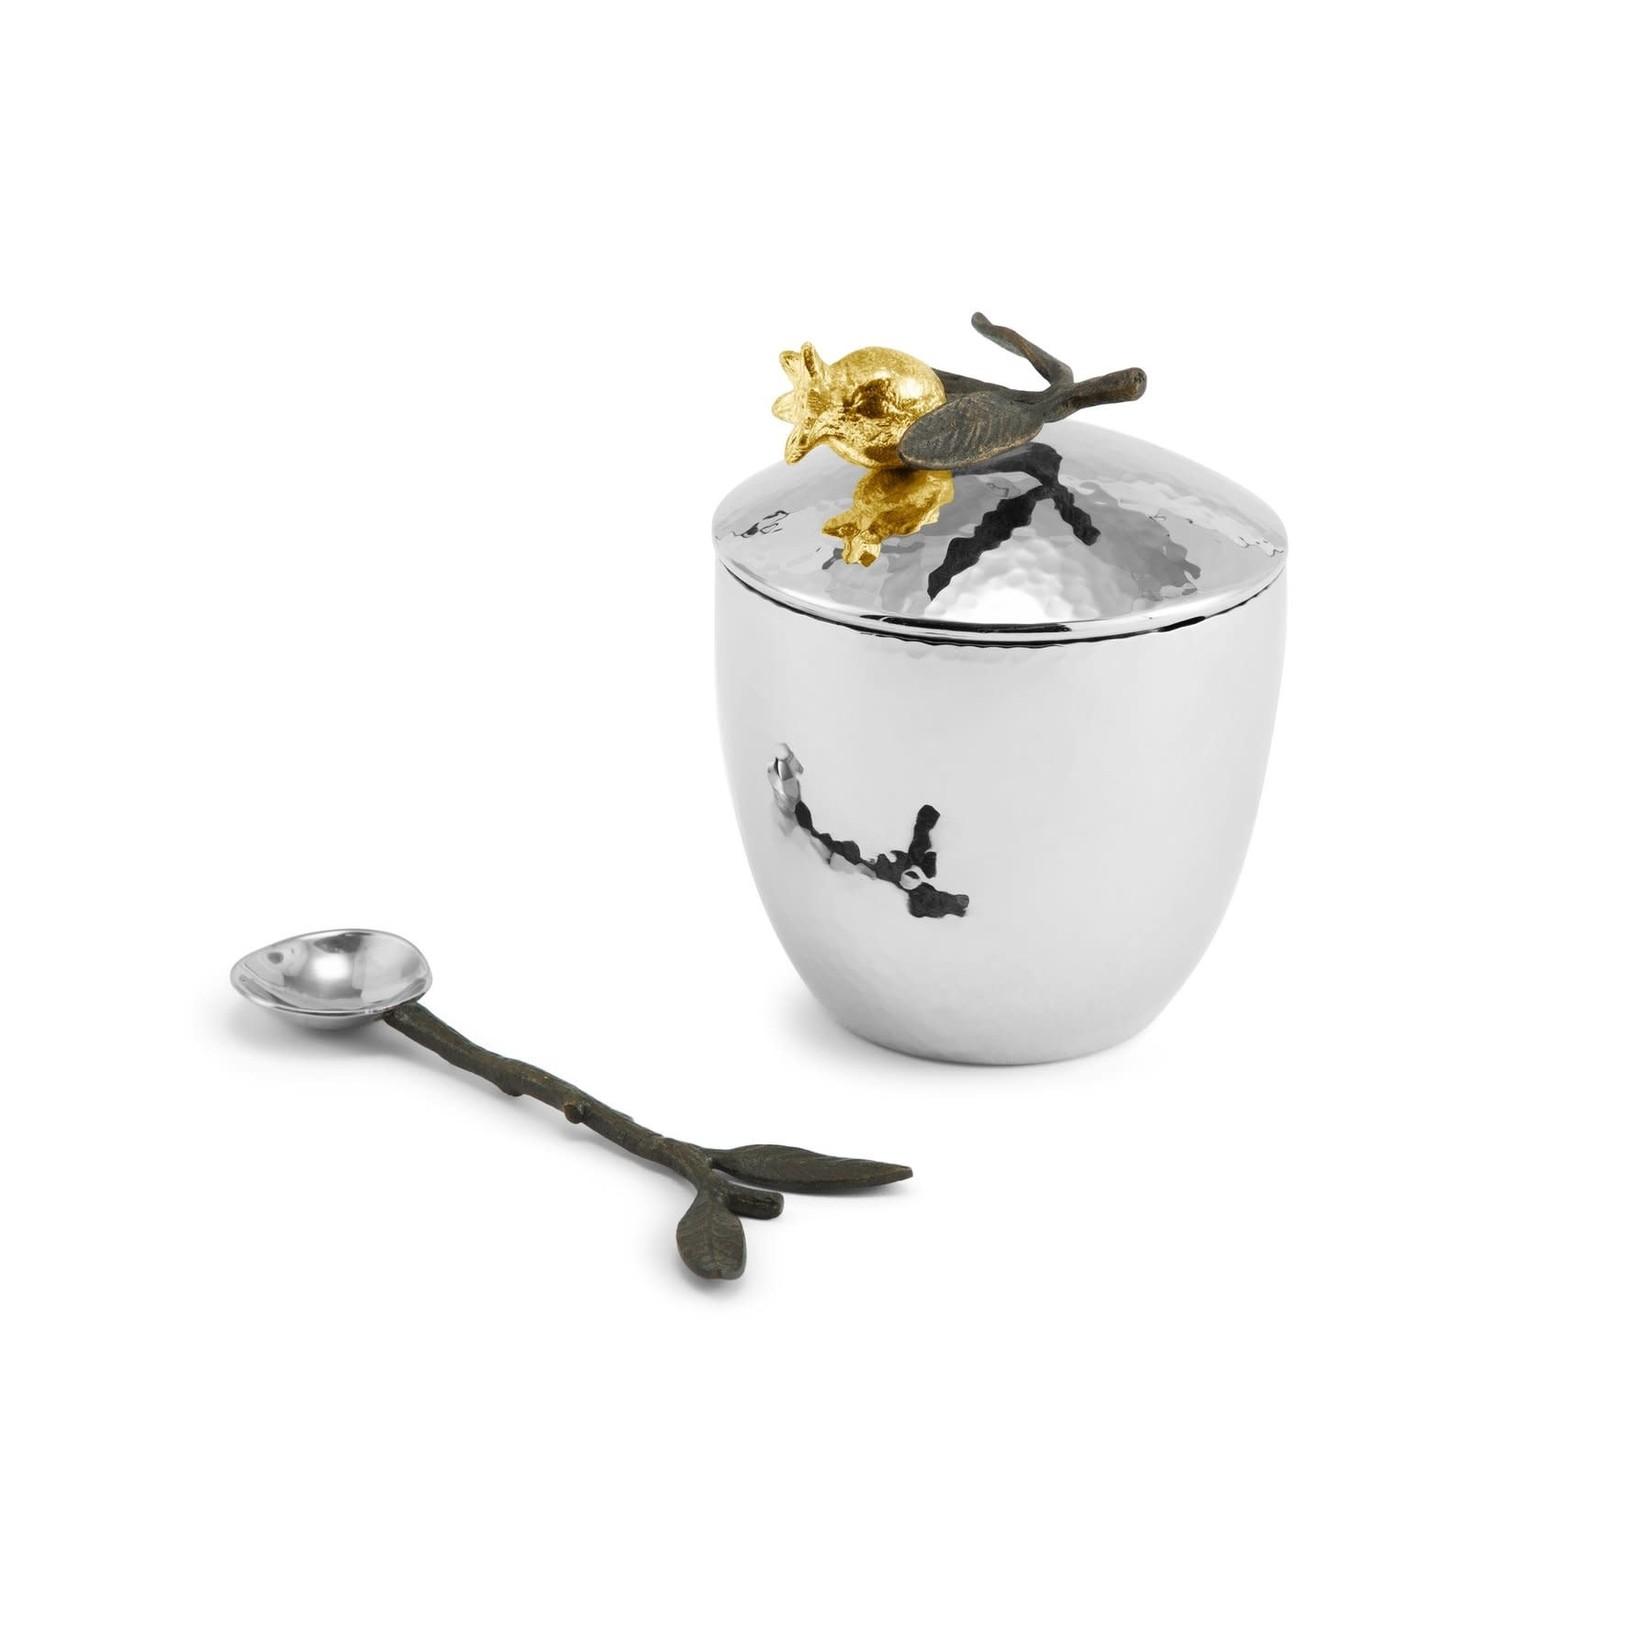 Michael Aram Sugar Pot with spoon